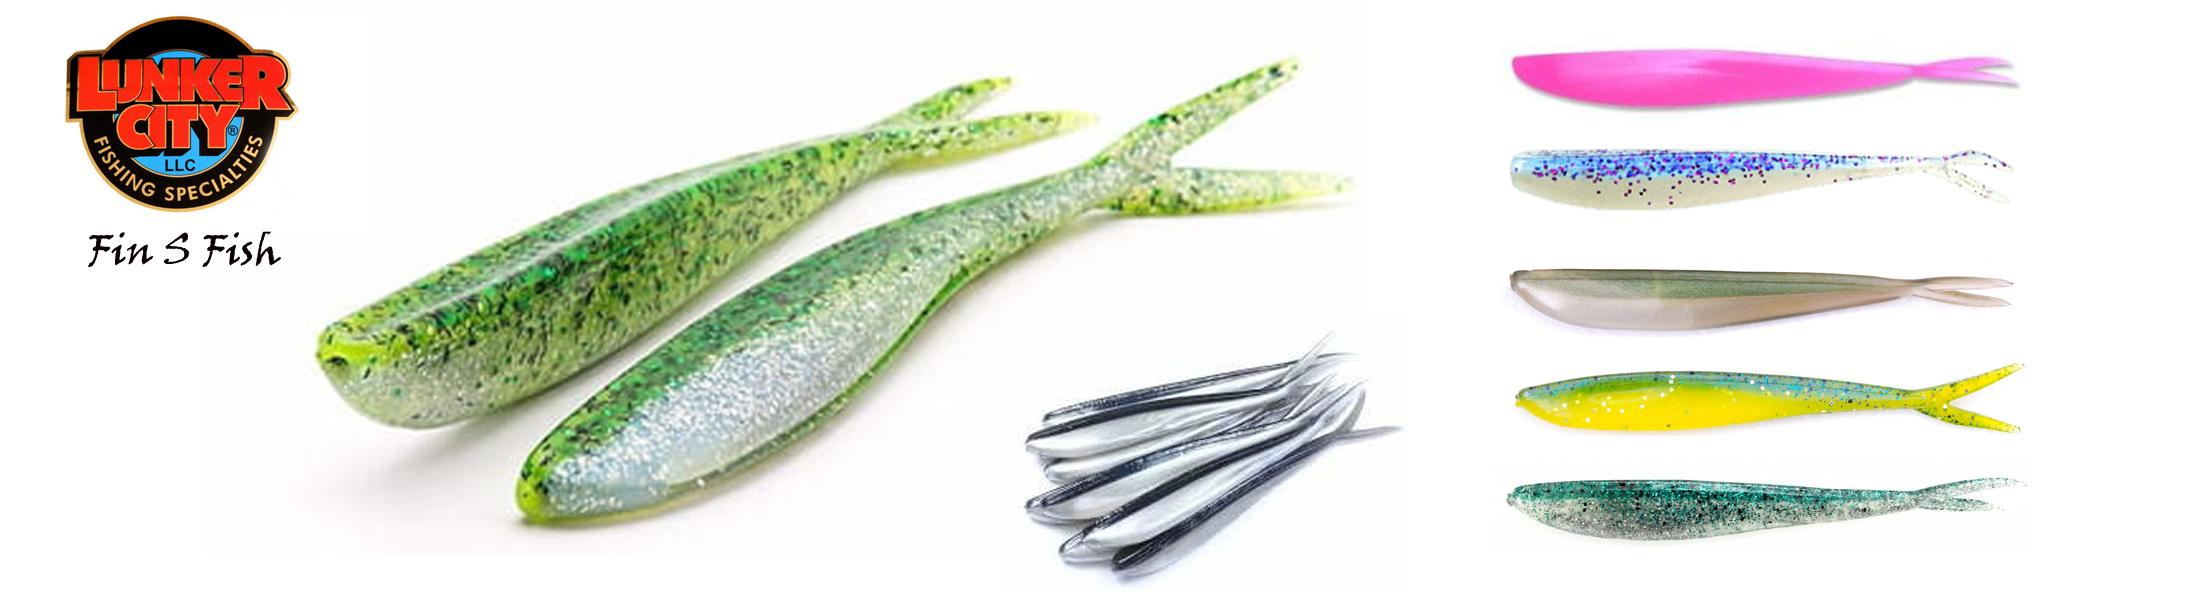 Fin s Fish